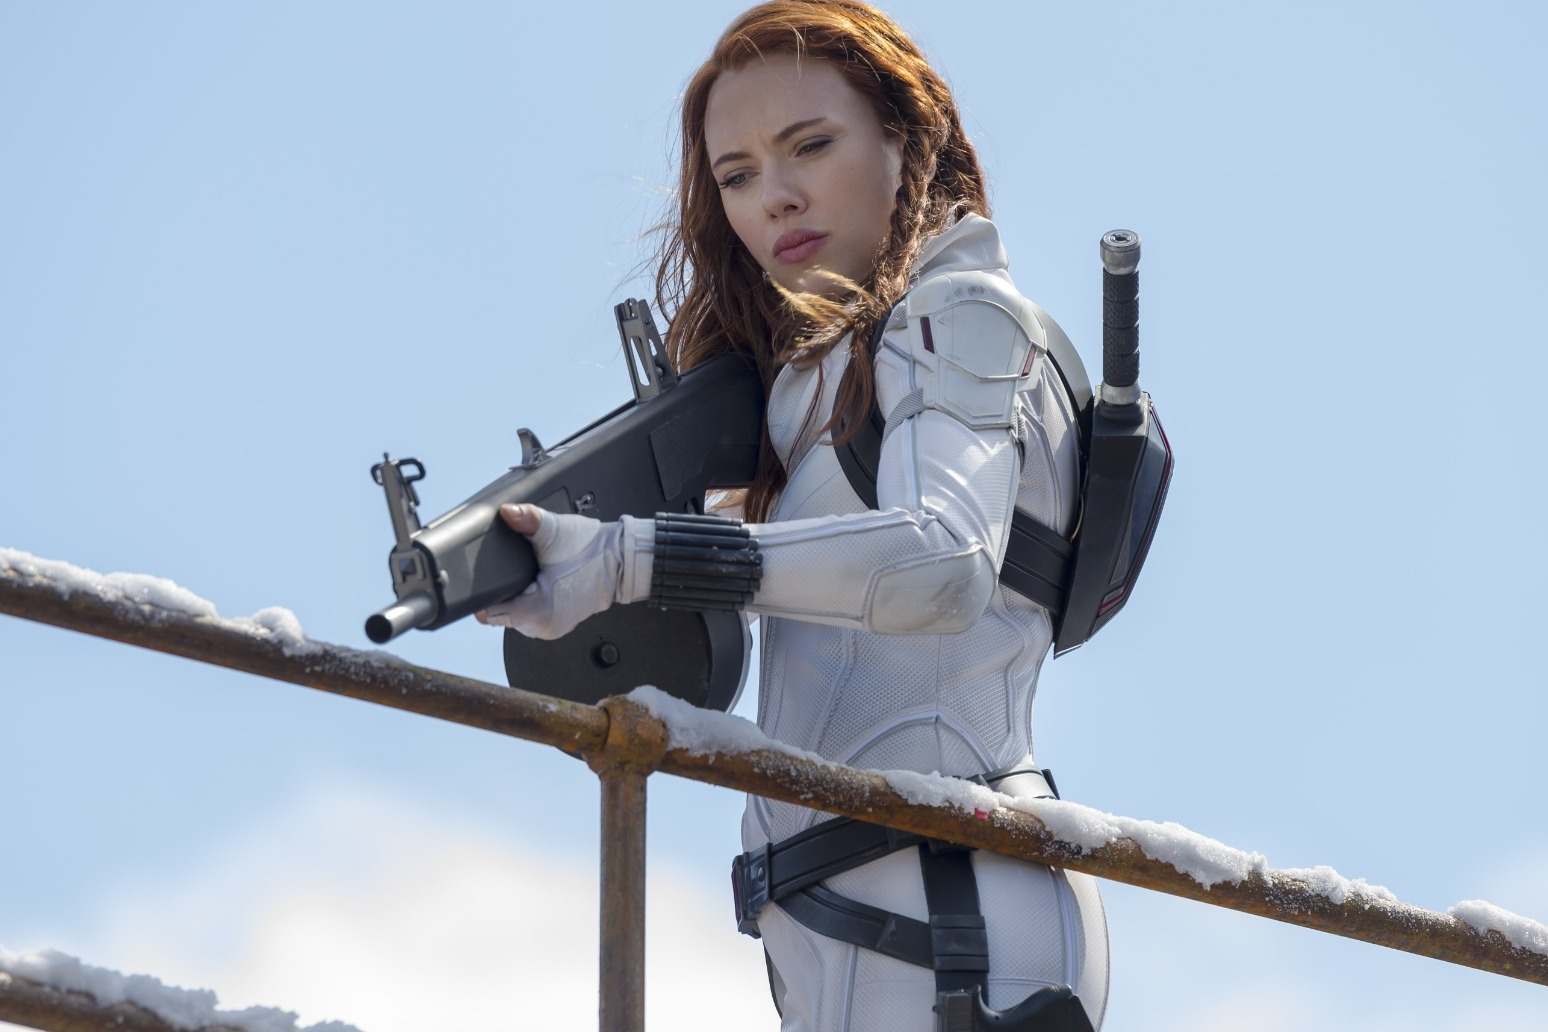 Scarlett Johansson and Disney reach settlement in Black Widow dispute